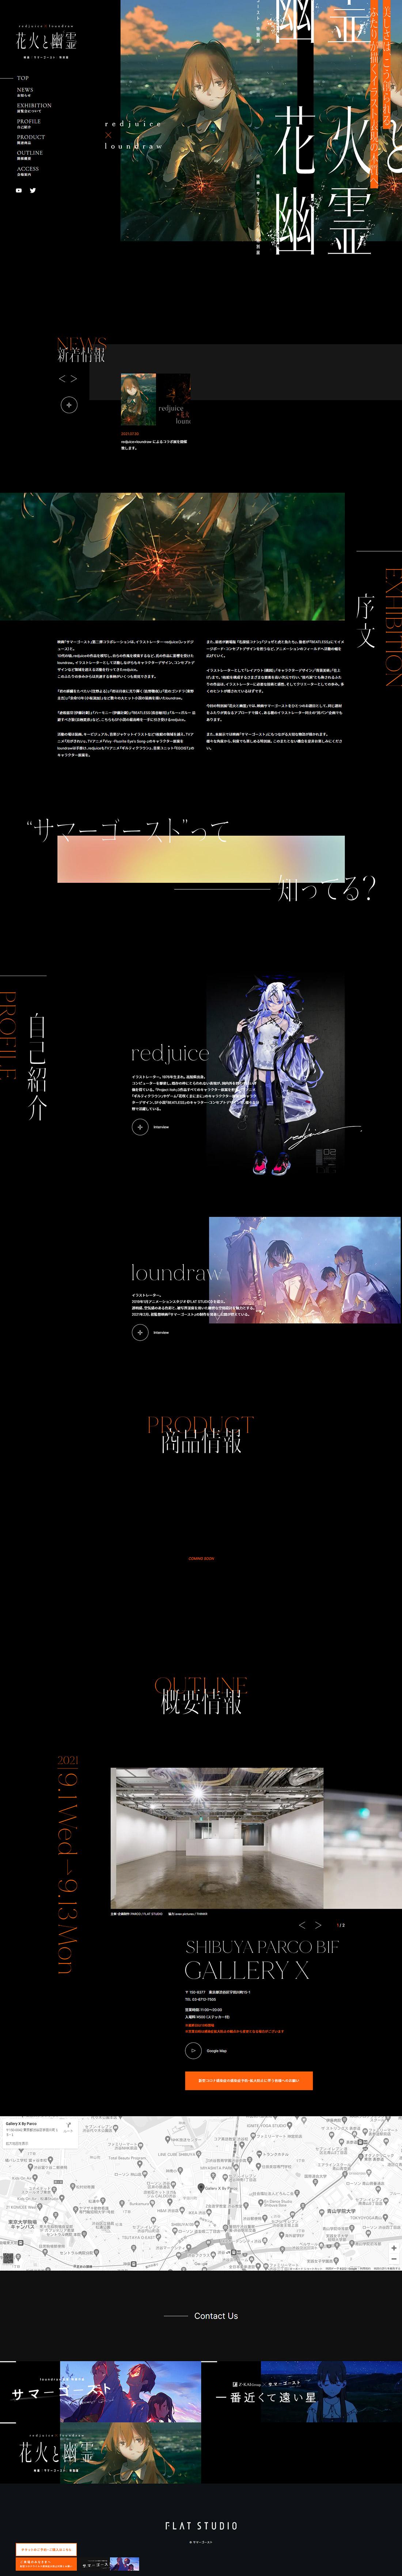 redjuice×loundraw 特別展「花火と幽霊」特設サイト